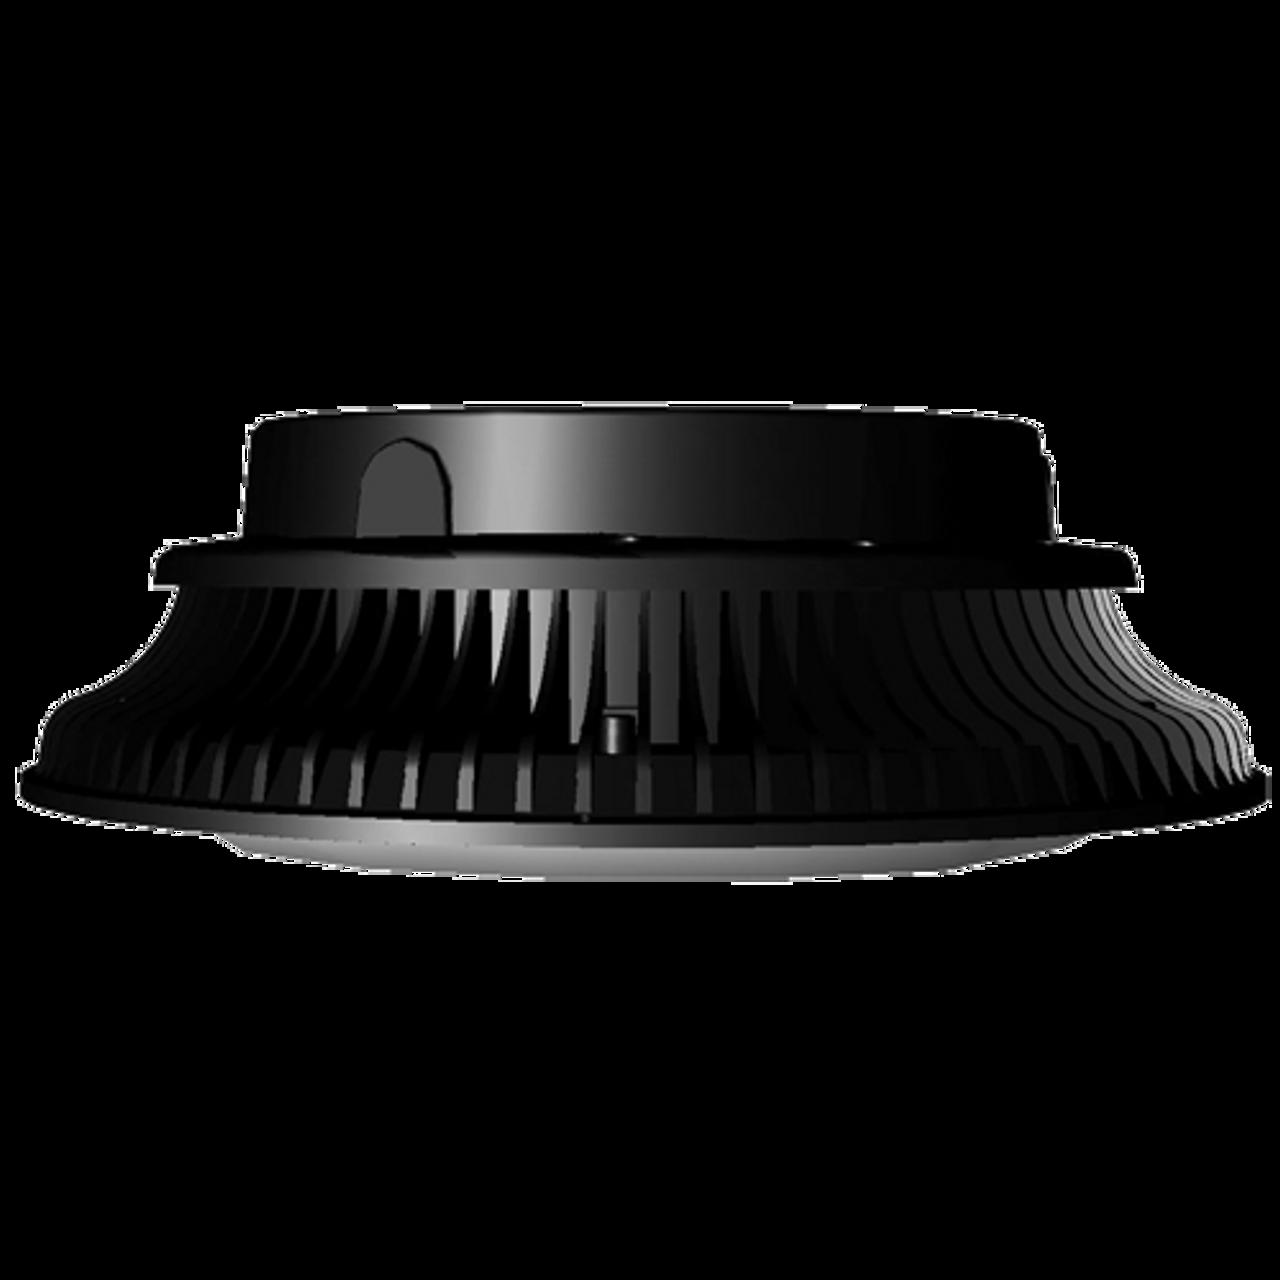 37 Watt LED Reveal Small Round Canopy Light